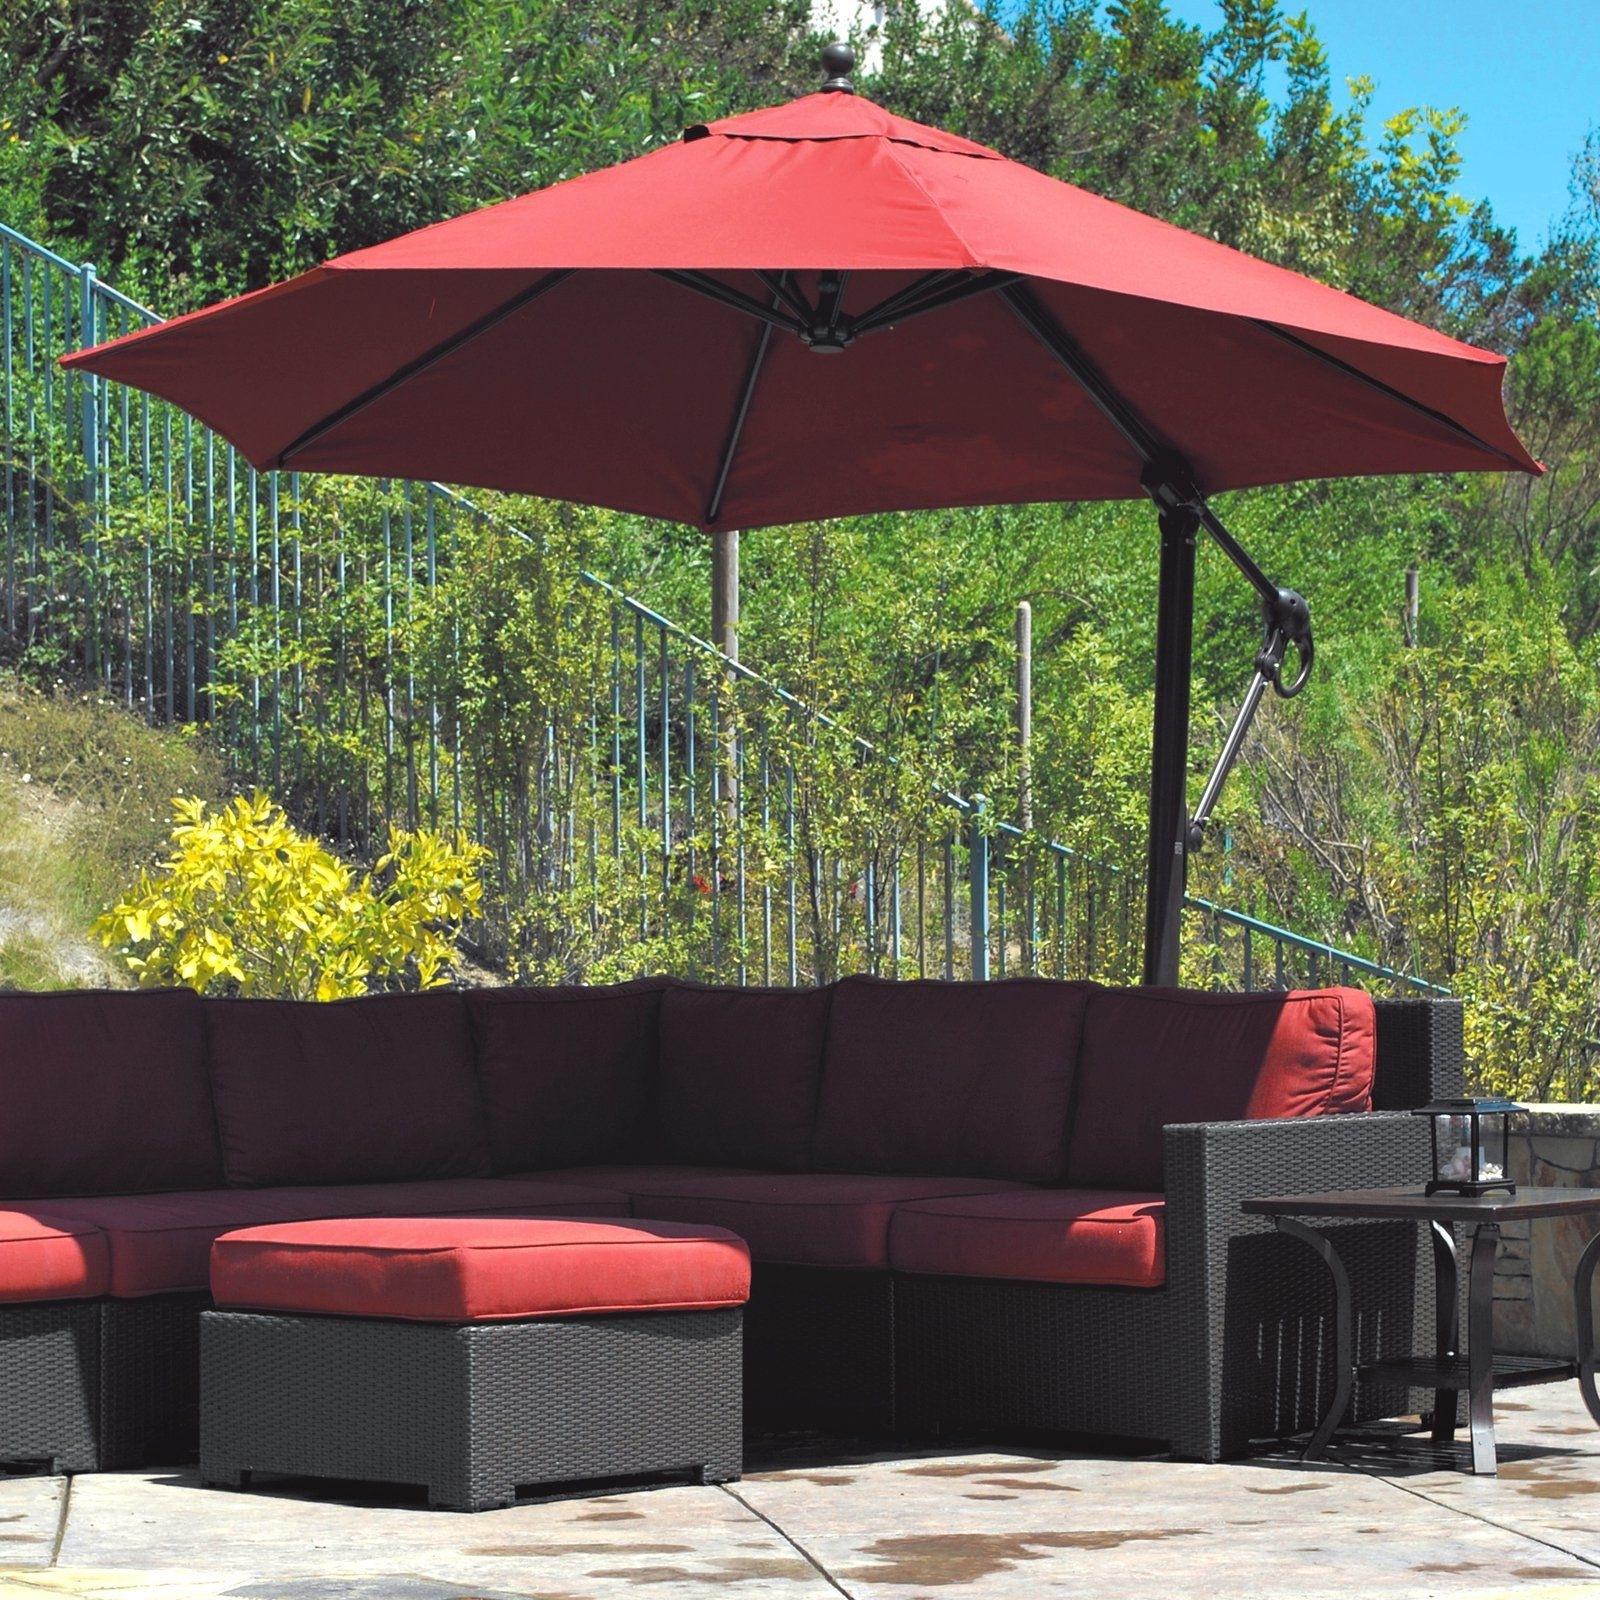 Lowes Patio Umbrellas Luxury Umbrella Sale Elegant Cool – Home With Recent Lowes Cantilever Patio Umbrellas (View 18 of 20)